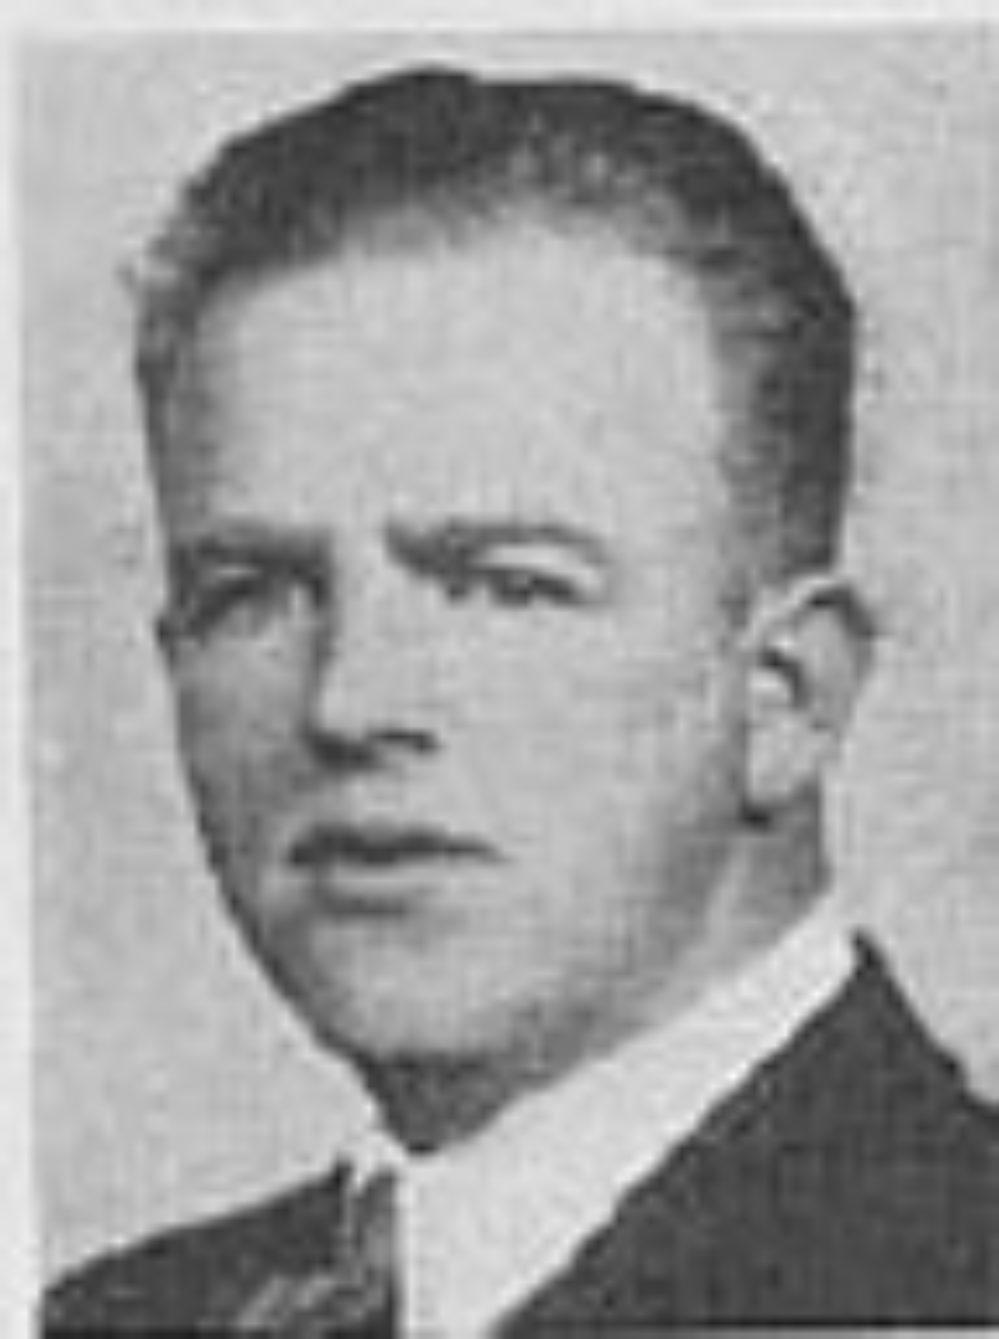 Ernst Martin Rolf Totland